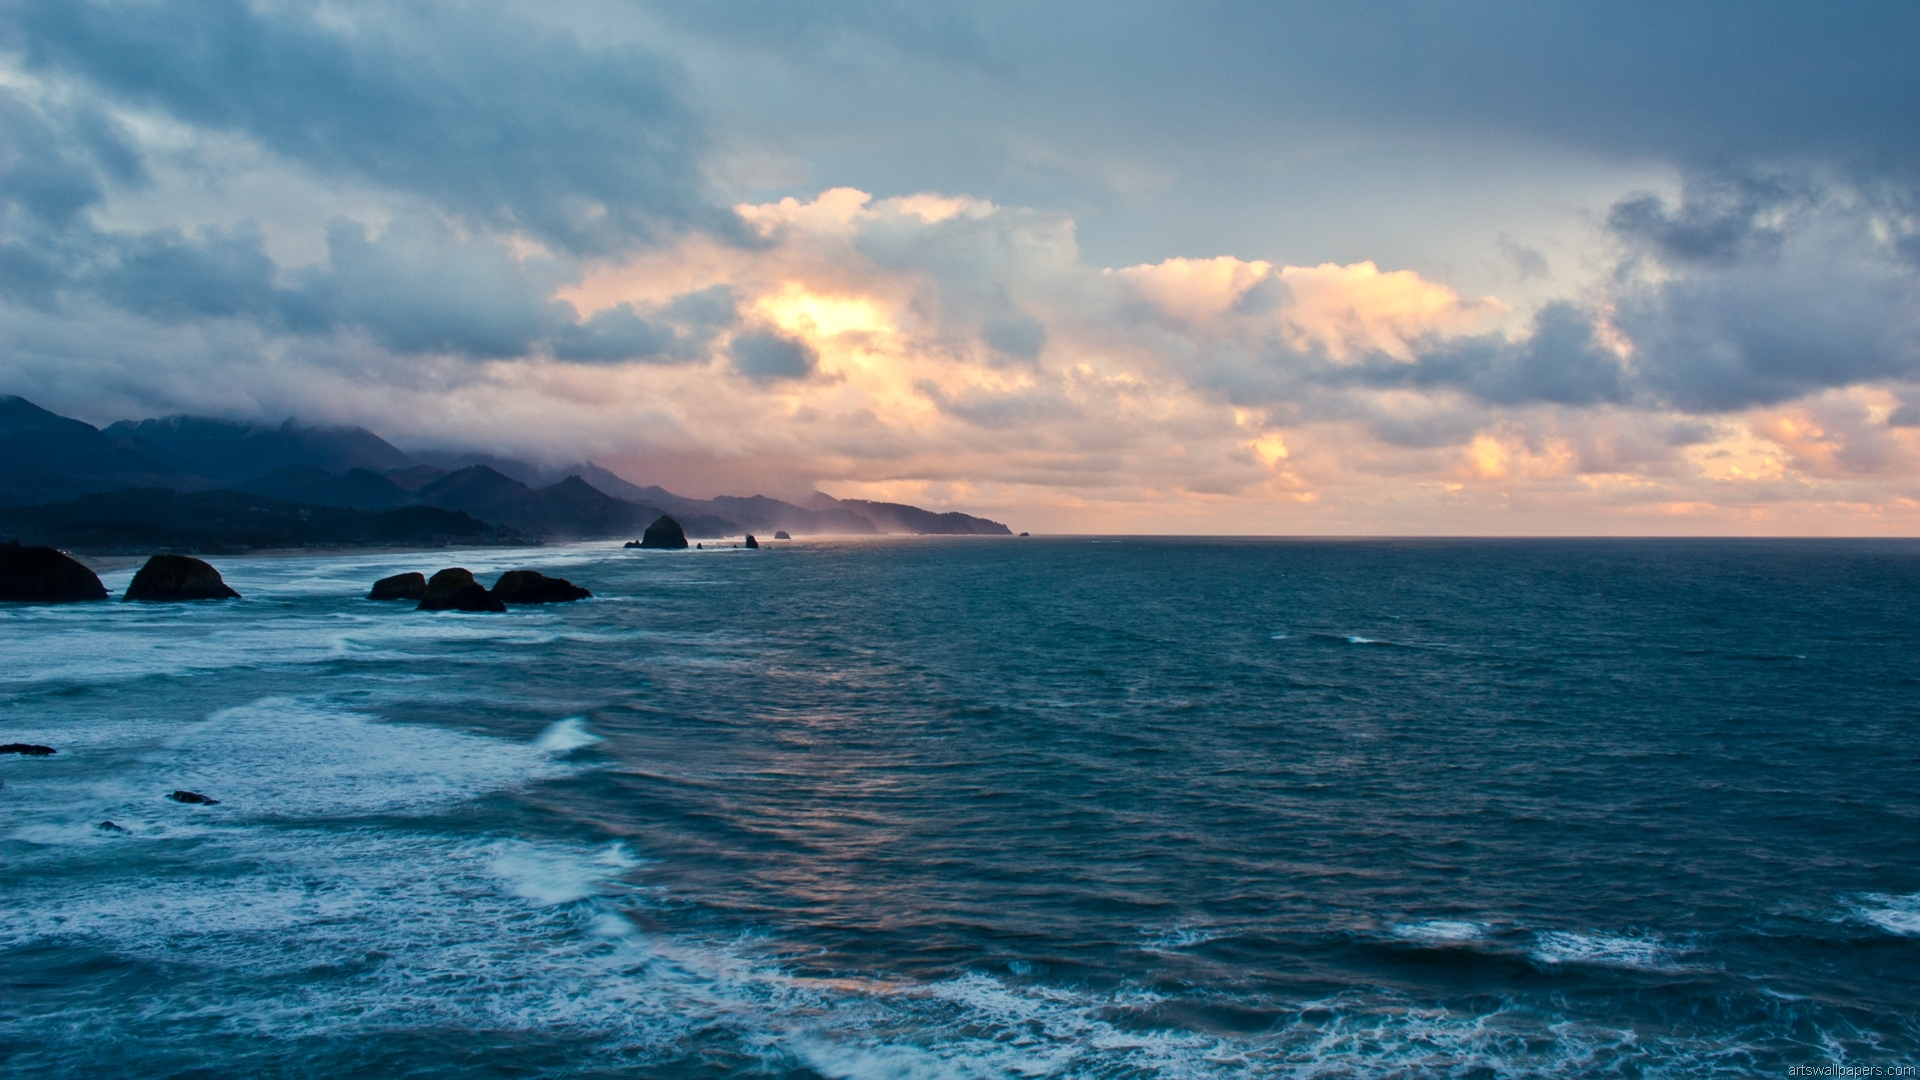 Sea Ocean Wallpaper HD Full HD 1080p Desktop Wallpaper 1920x1080